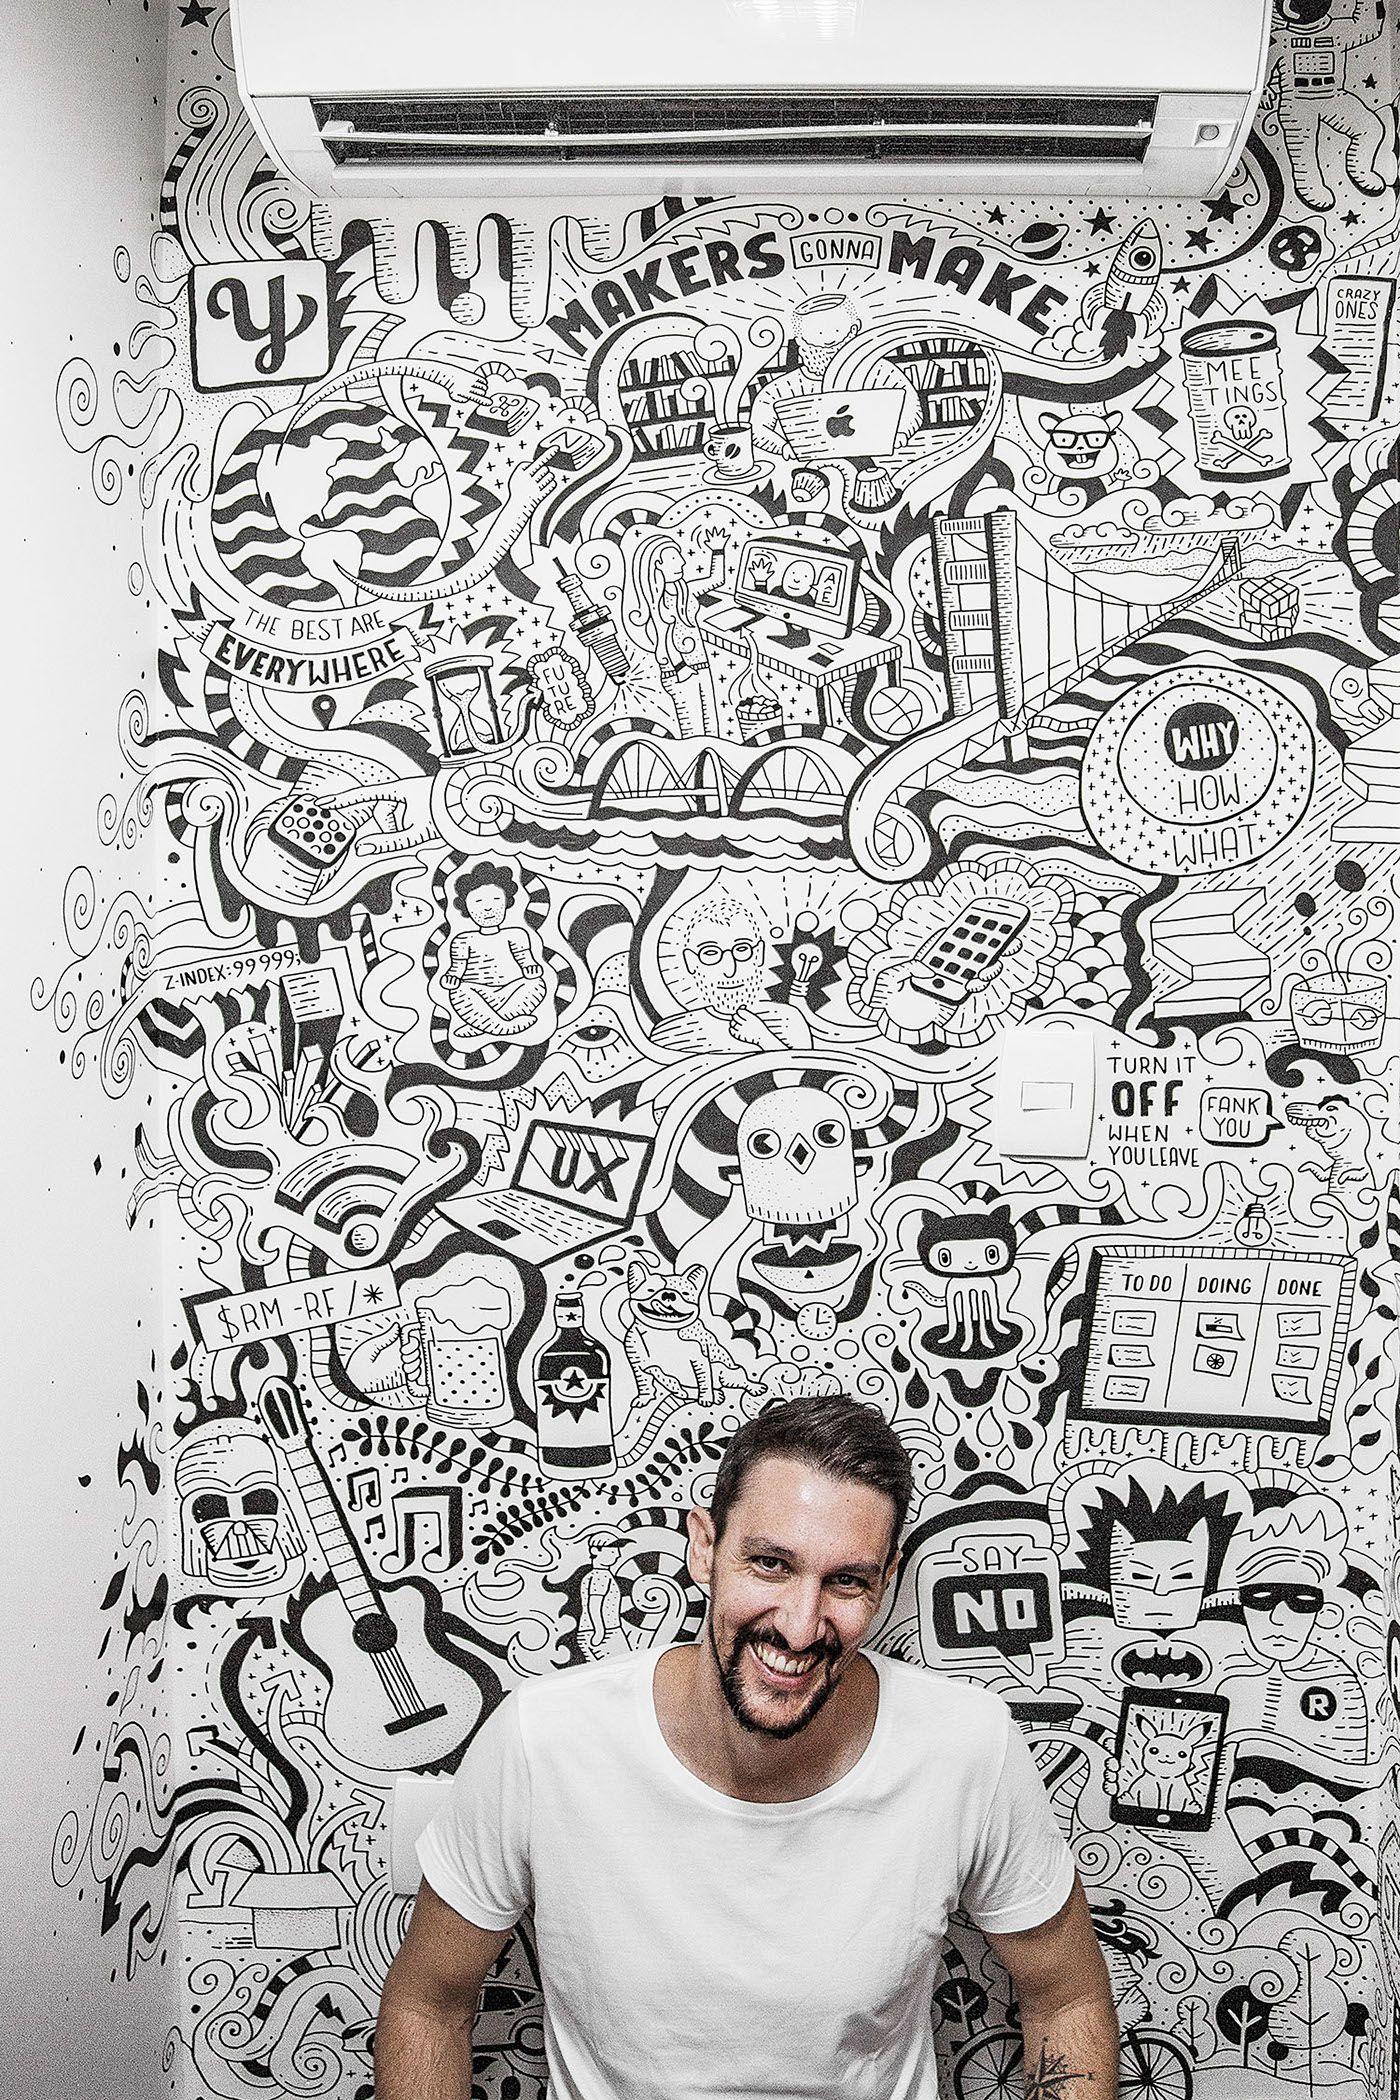 Mural Art For Startae Mural Wall Art Wall Drawing Mural